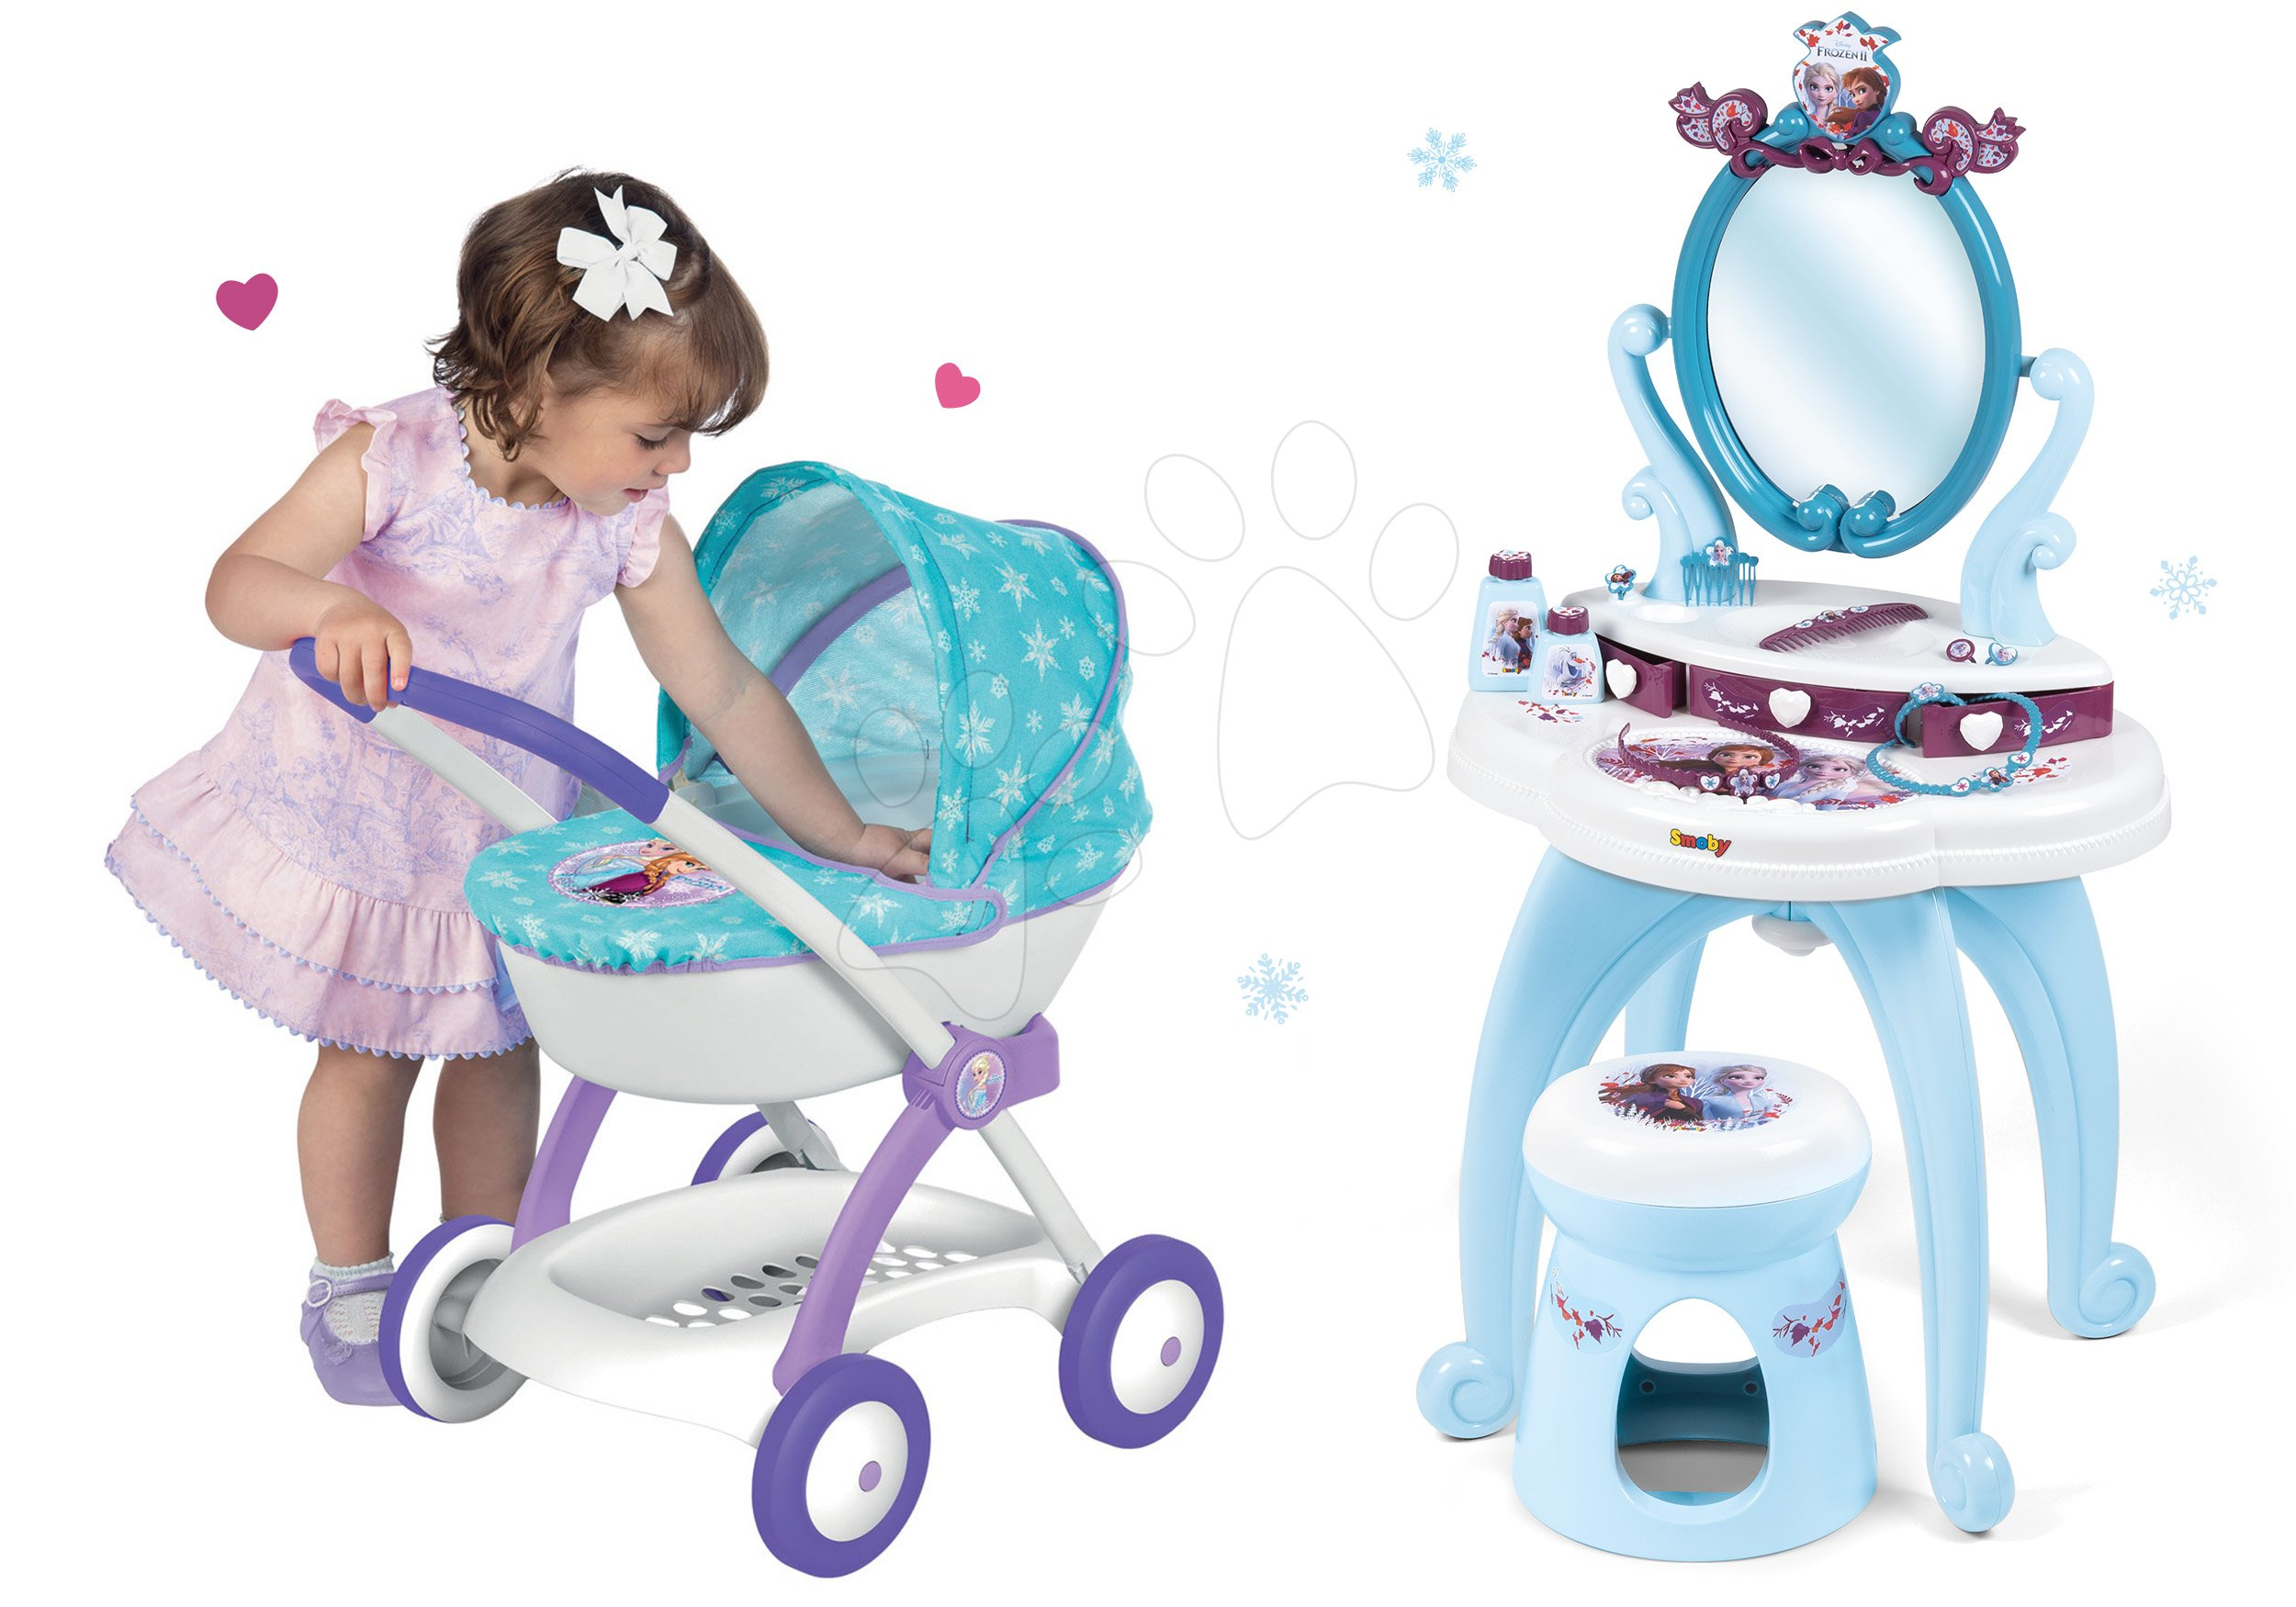 Kozmetické stolíky sety - Set kozmetický stolík Frozen Smoby so stoličkou a hlboký kočík pre bábiku Frozen (58 cm rúčka)